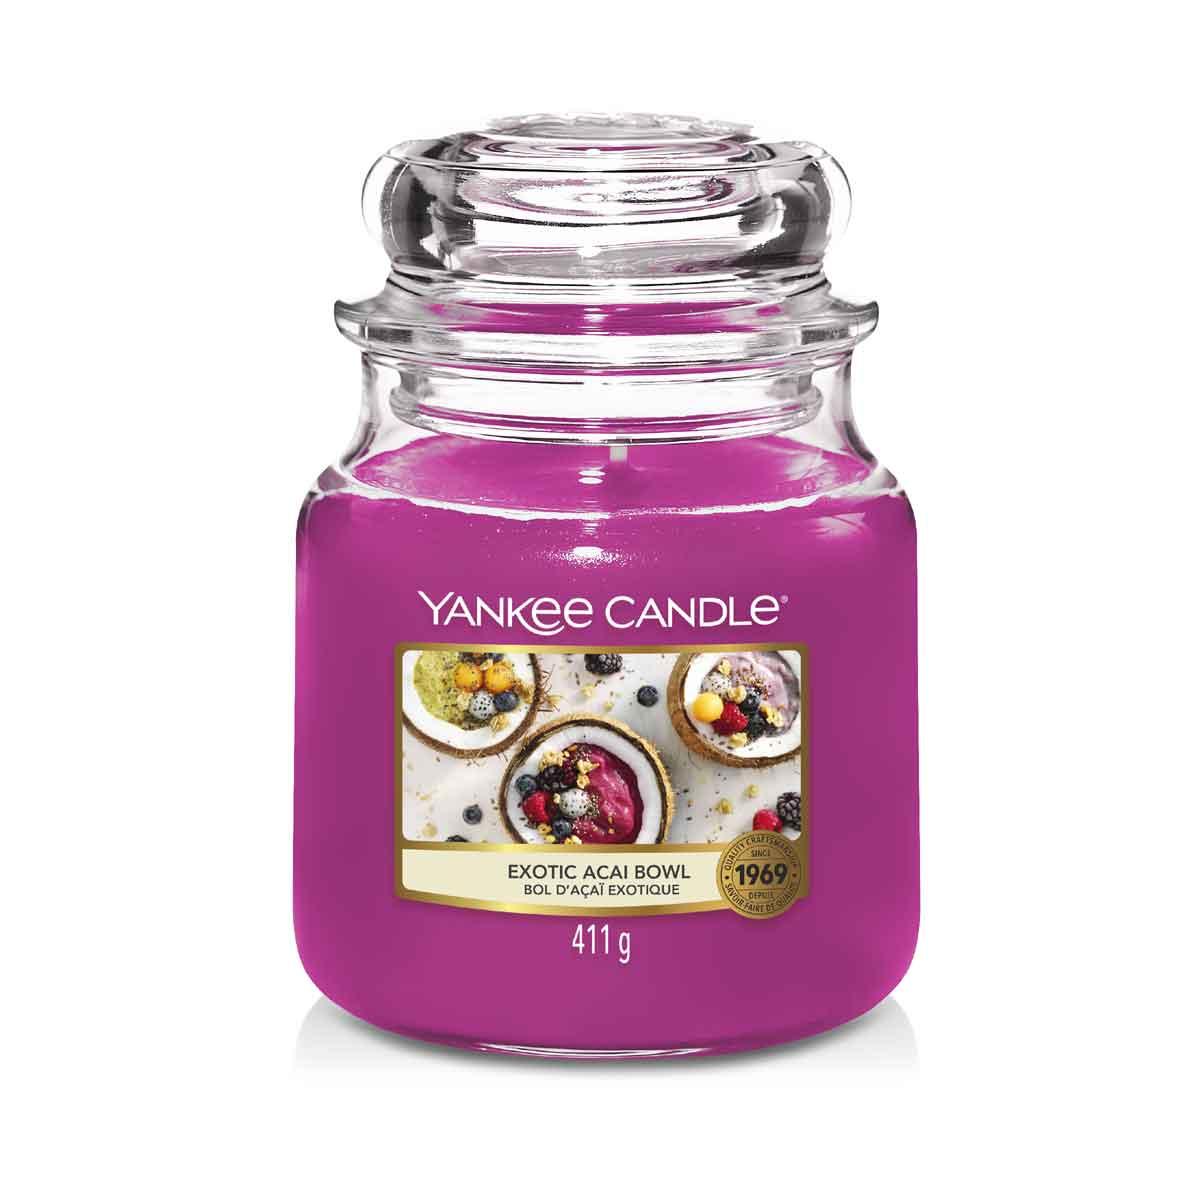 Yankee Candle Exotic Acai Bowl Giara Media